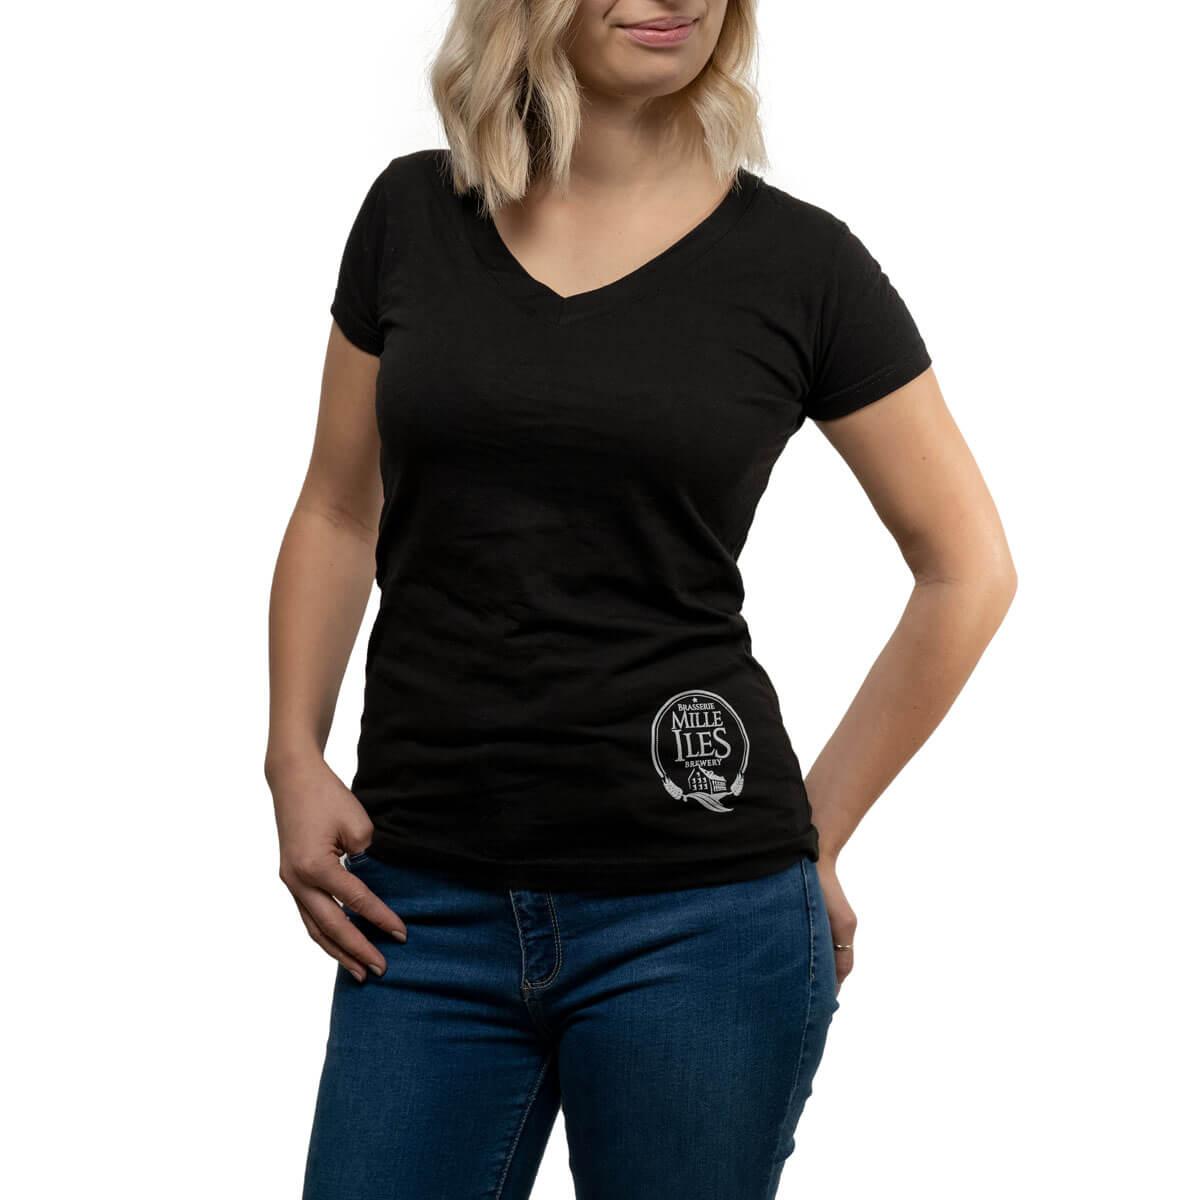 Mille-iles Brewery Women's T-shirt